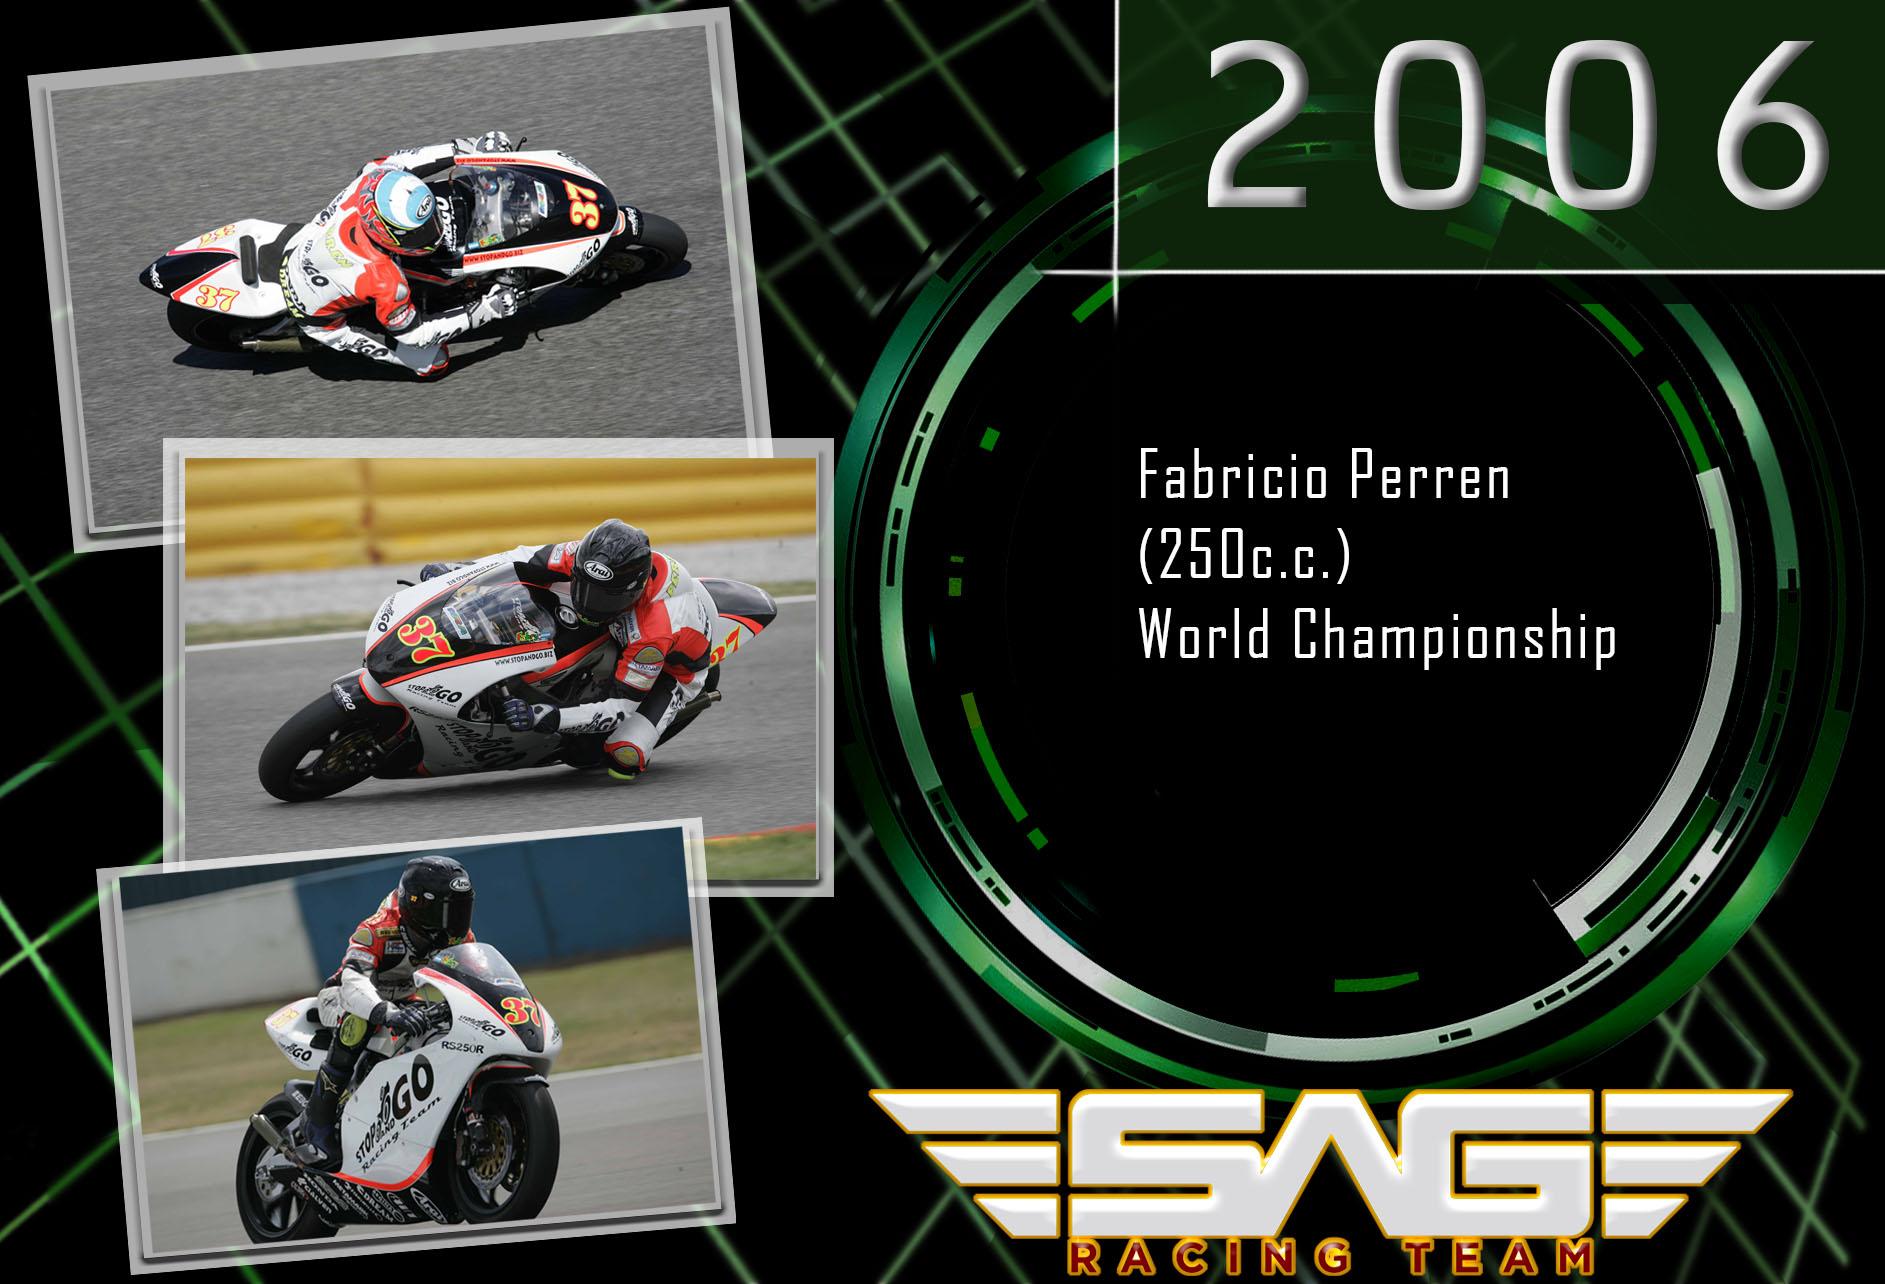 World Championship rider Fabricio Perron (250cc)